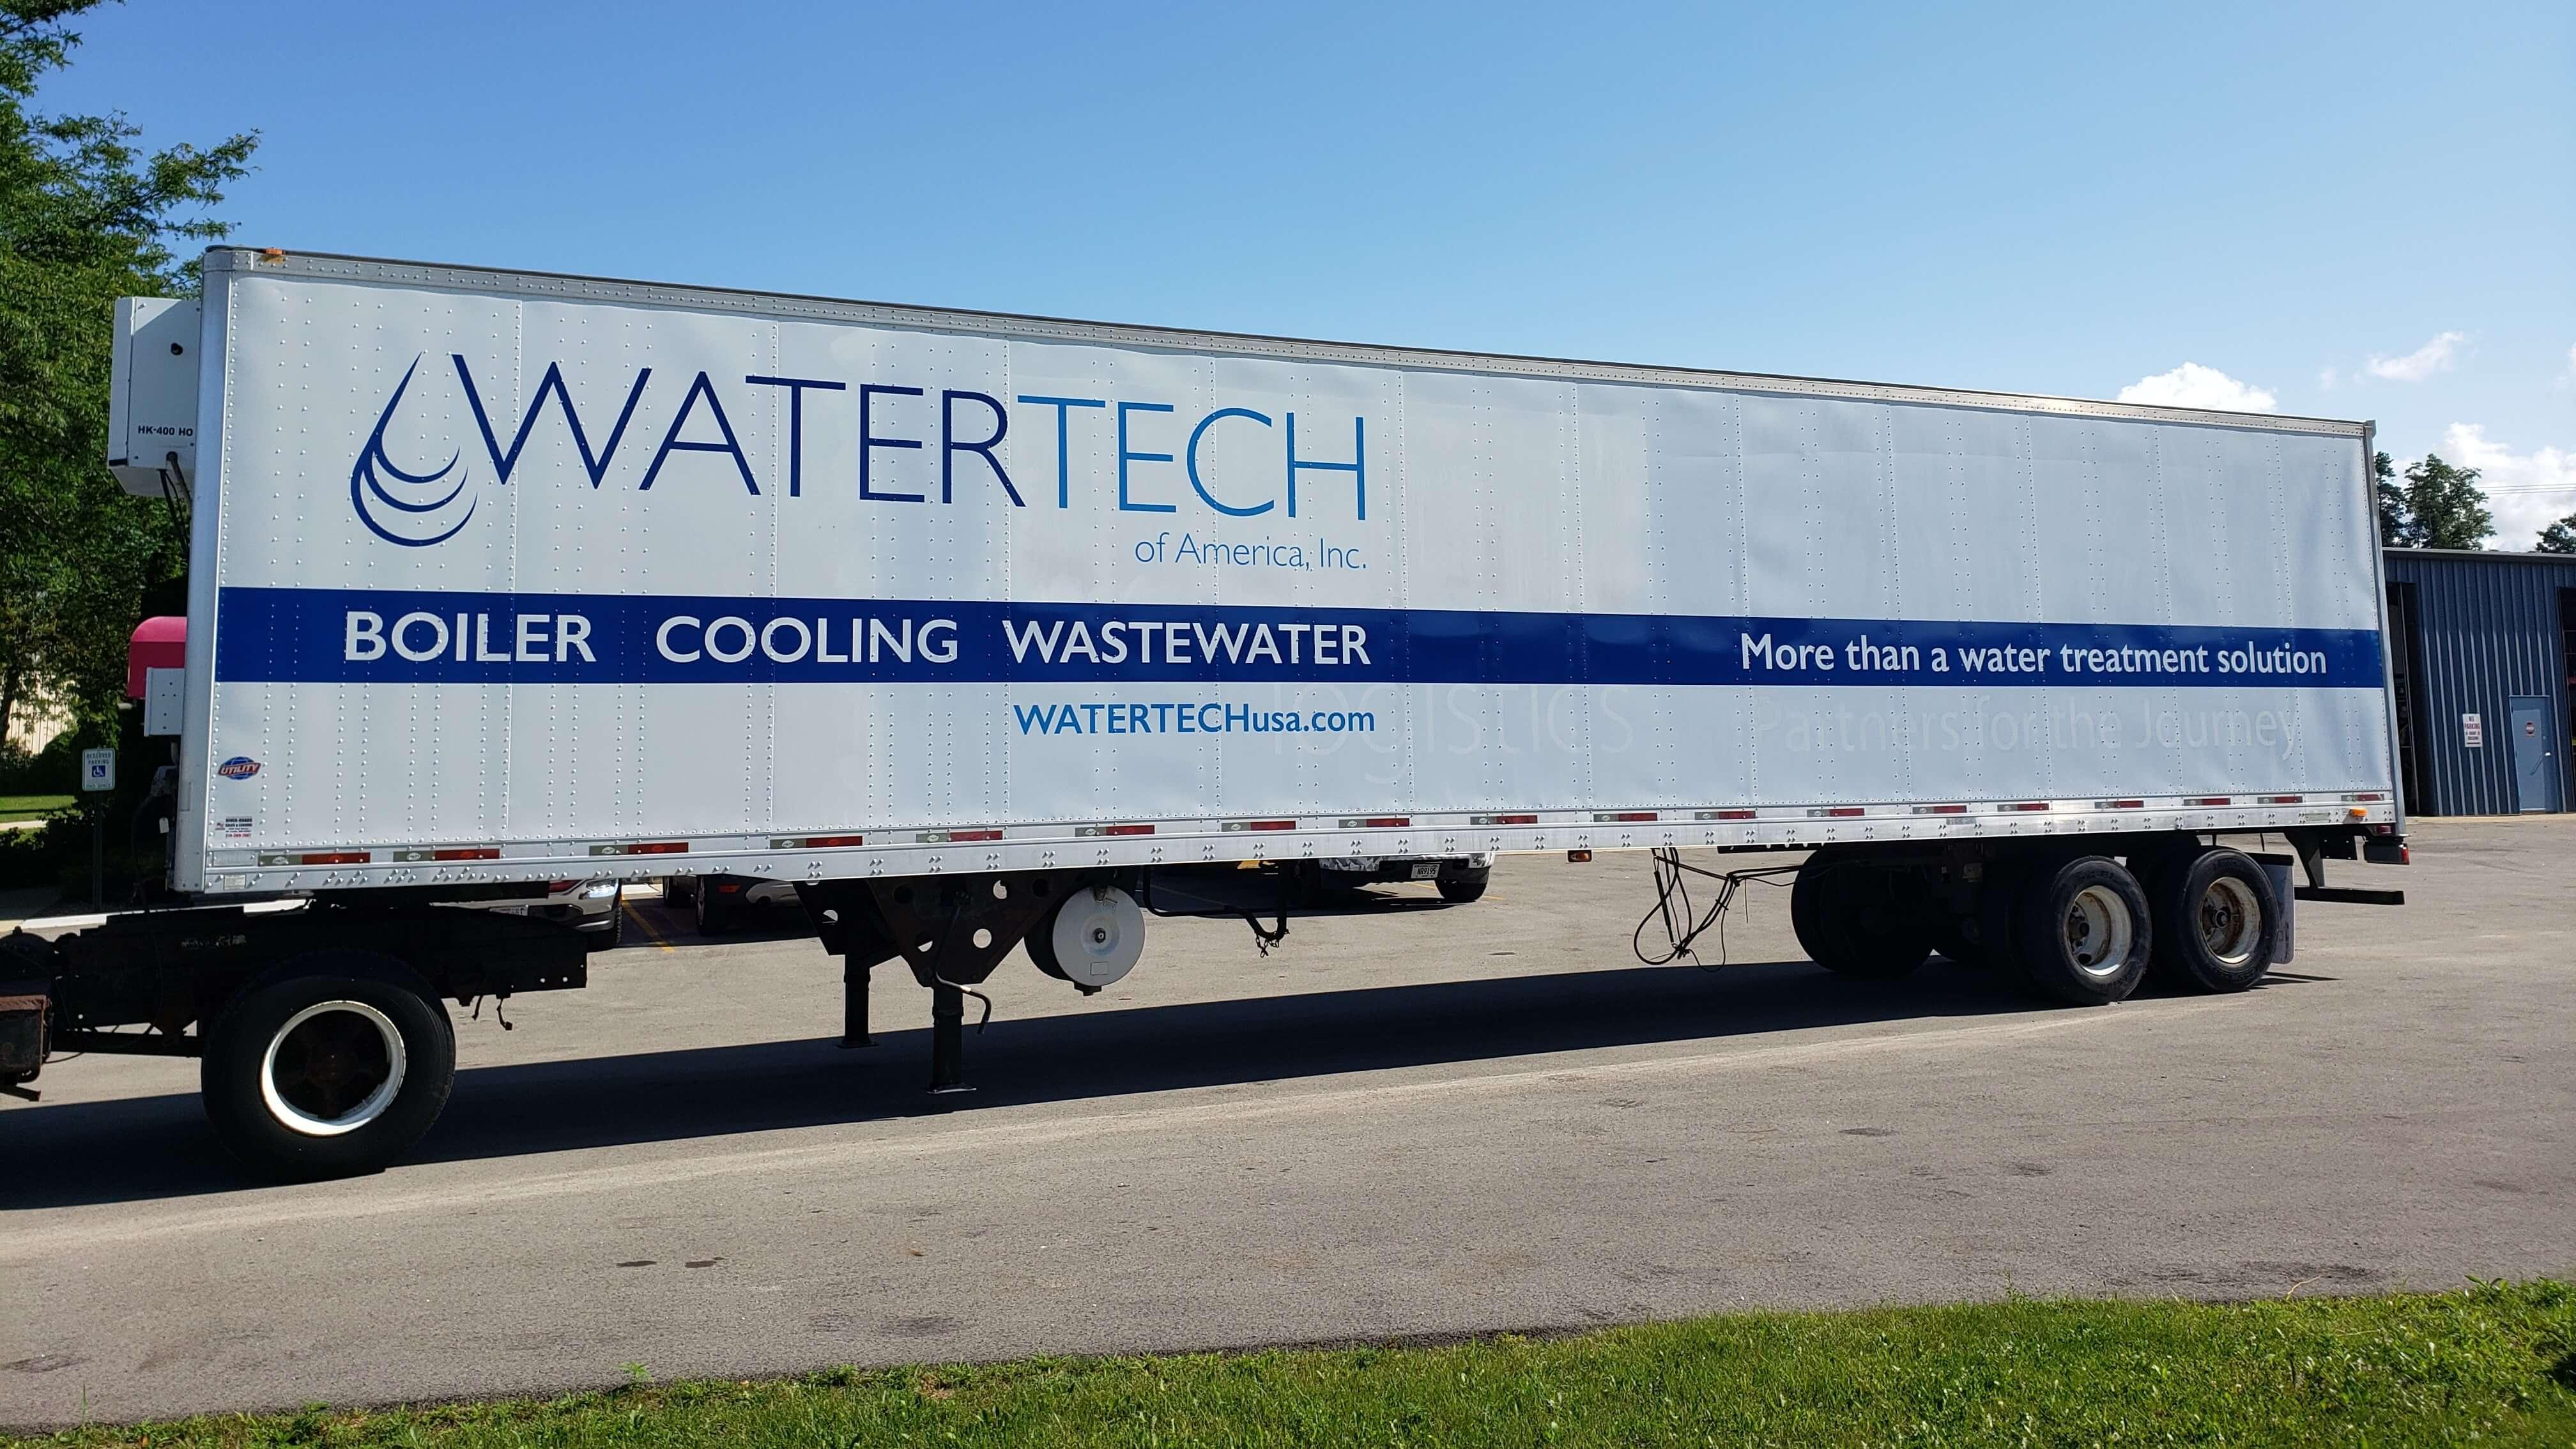 Watertech fleet side graphics